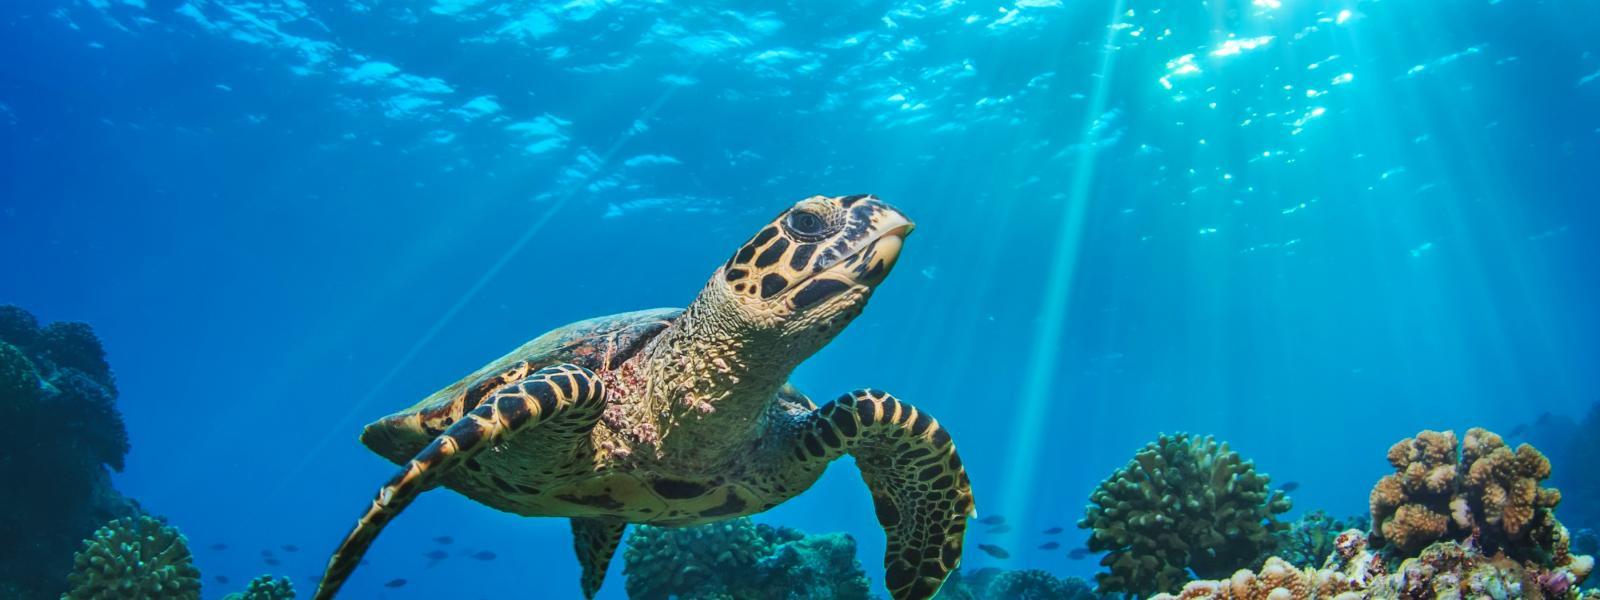 Sea turtle floating on coral reefs